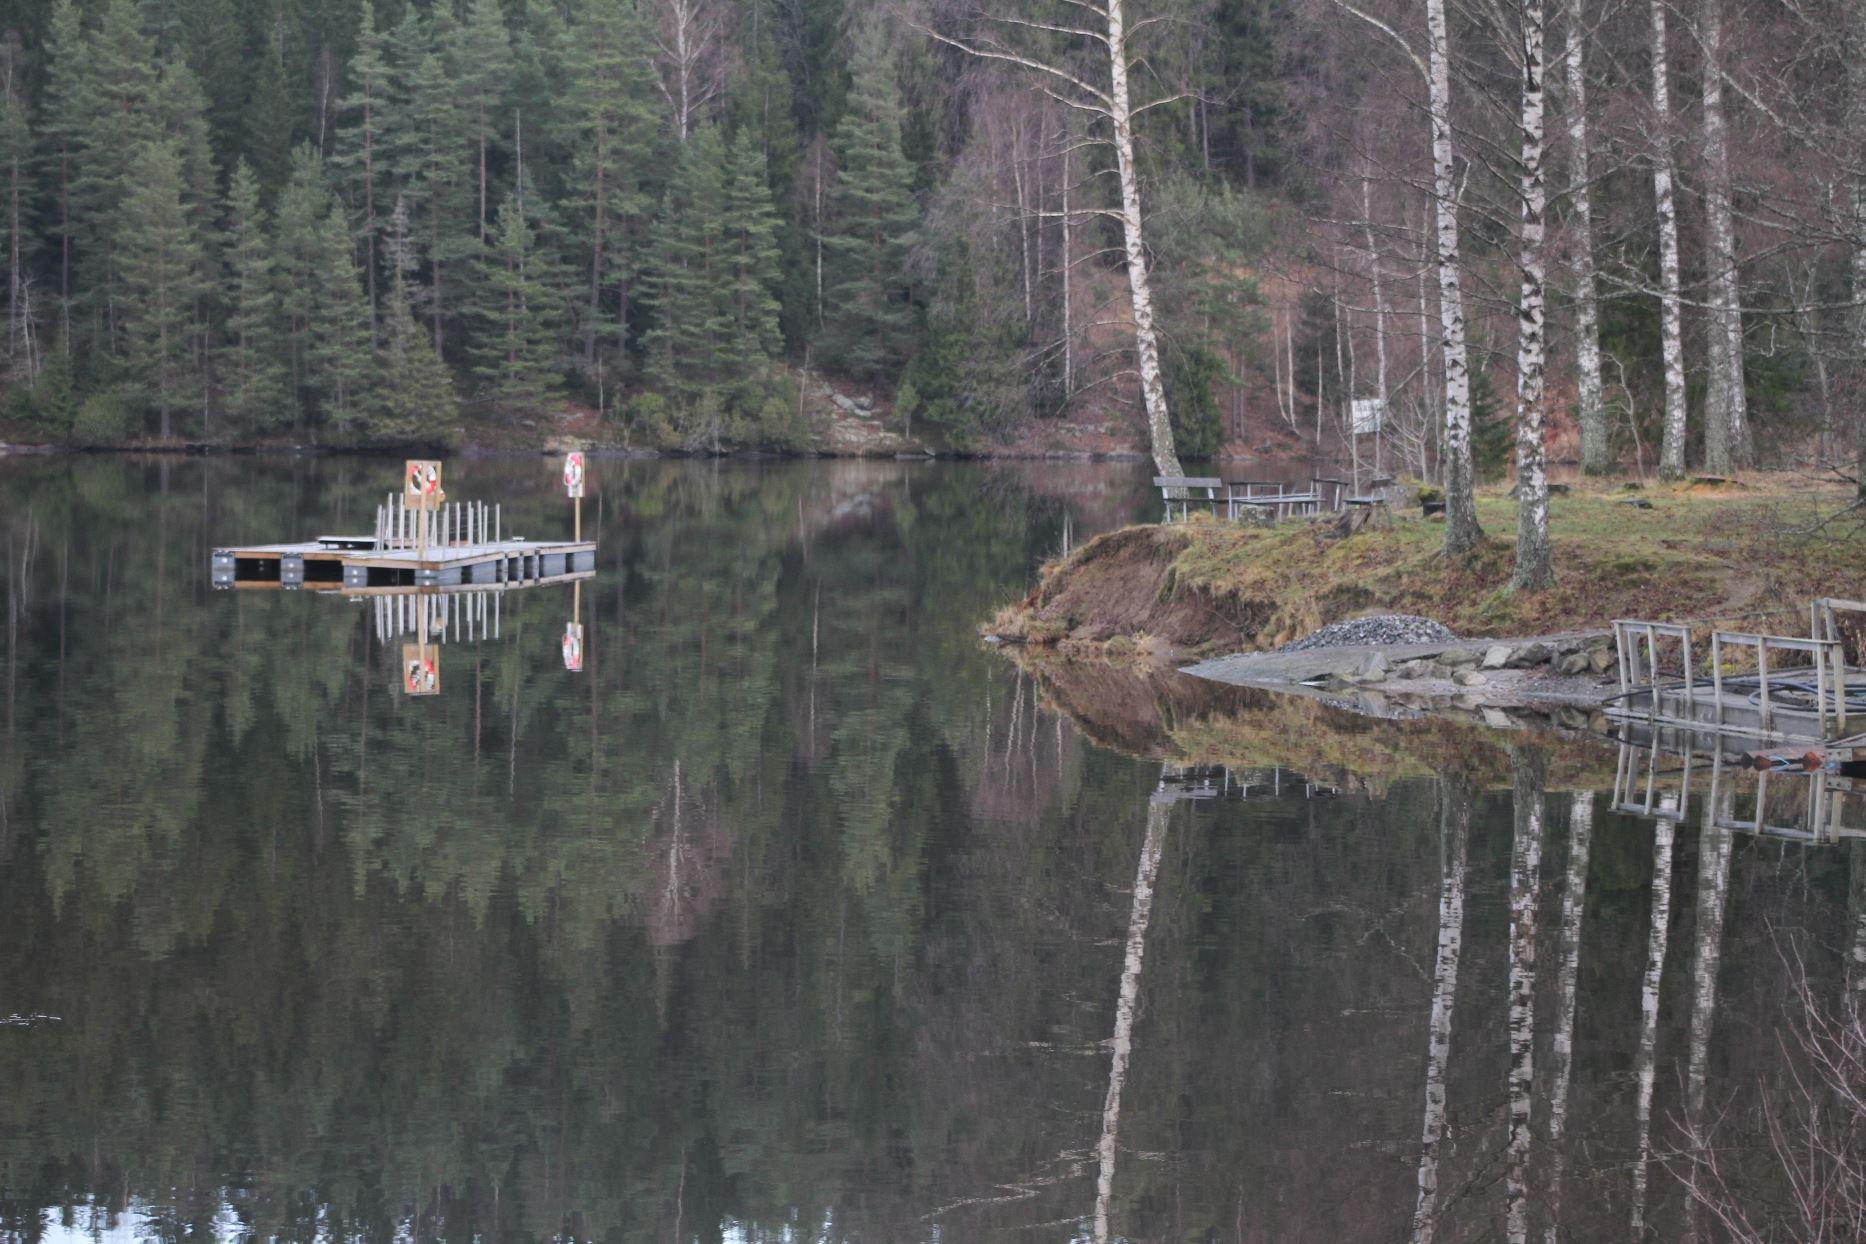 Glomma Mørkfoss - Solbergfoss